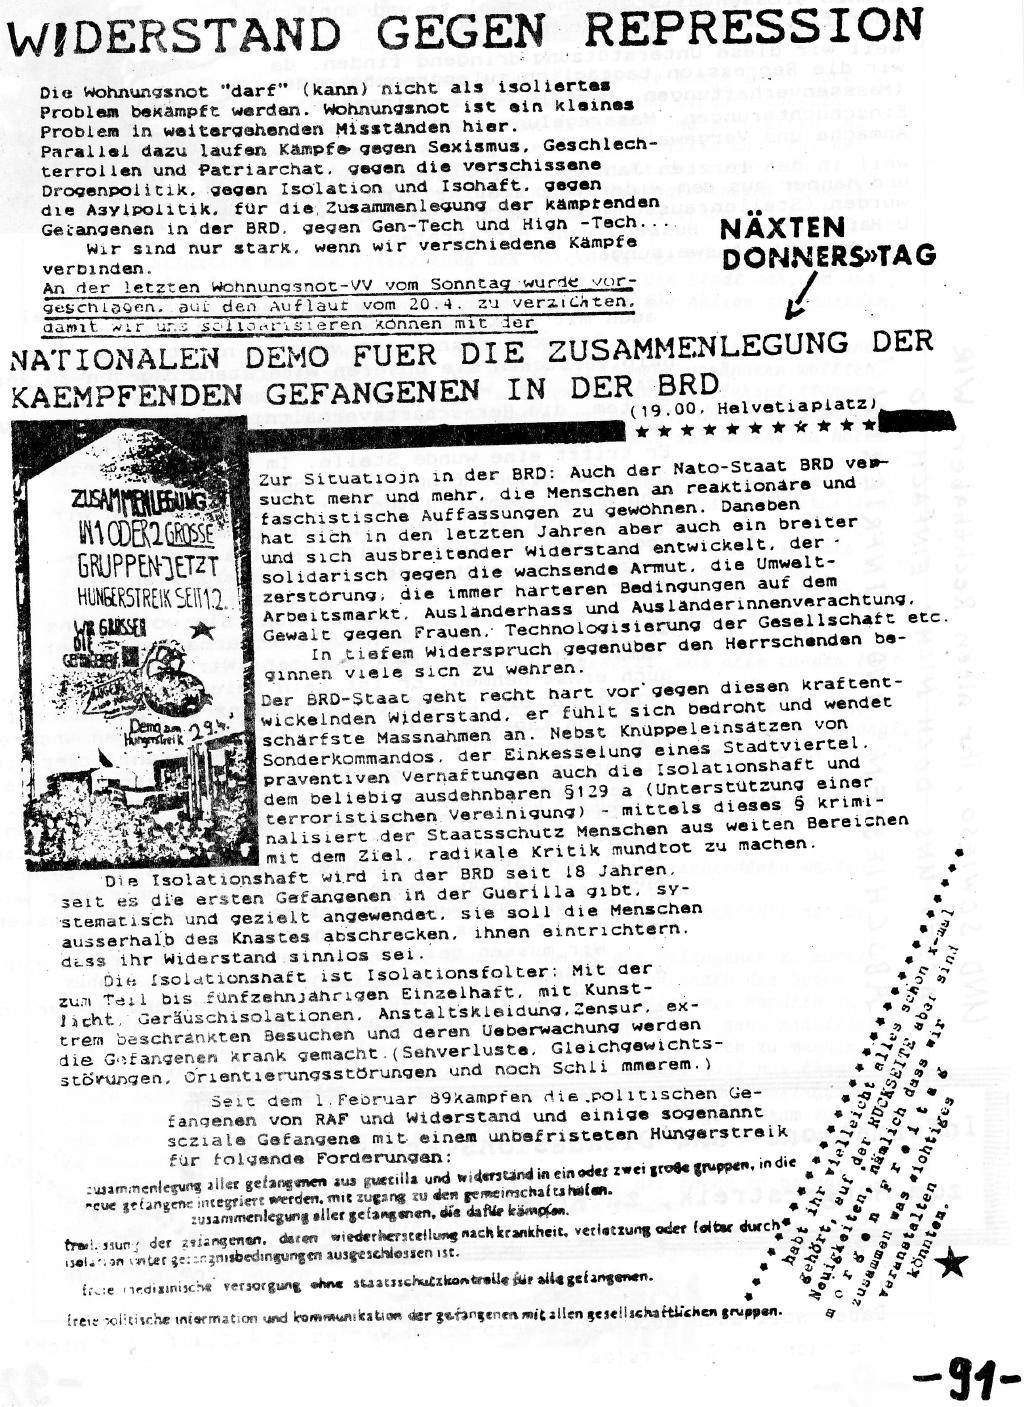 Belgien_Doku_Besetzung_EG_Kommission_1989_093